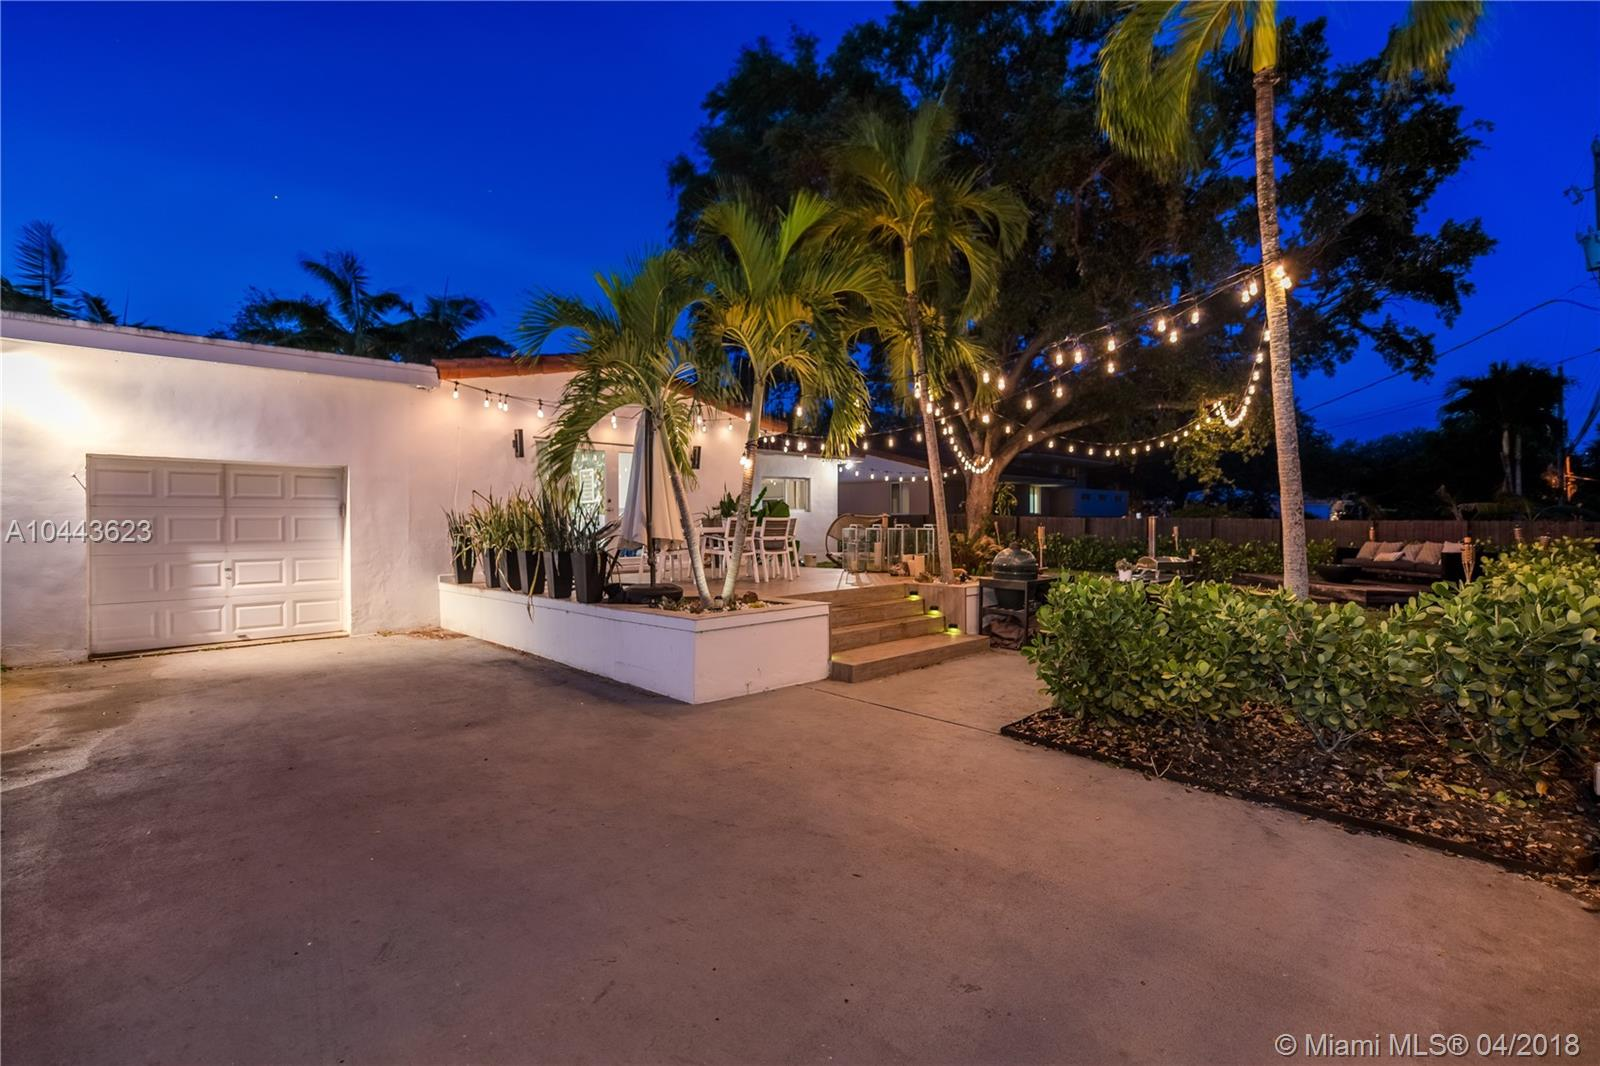 480 Ne 103rd St, Miami Shores FL, 33138